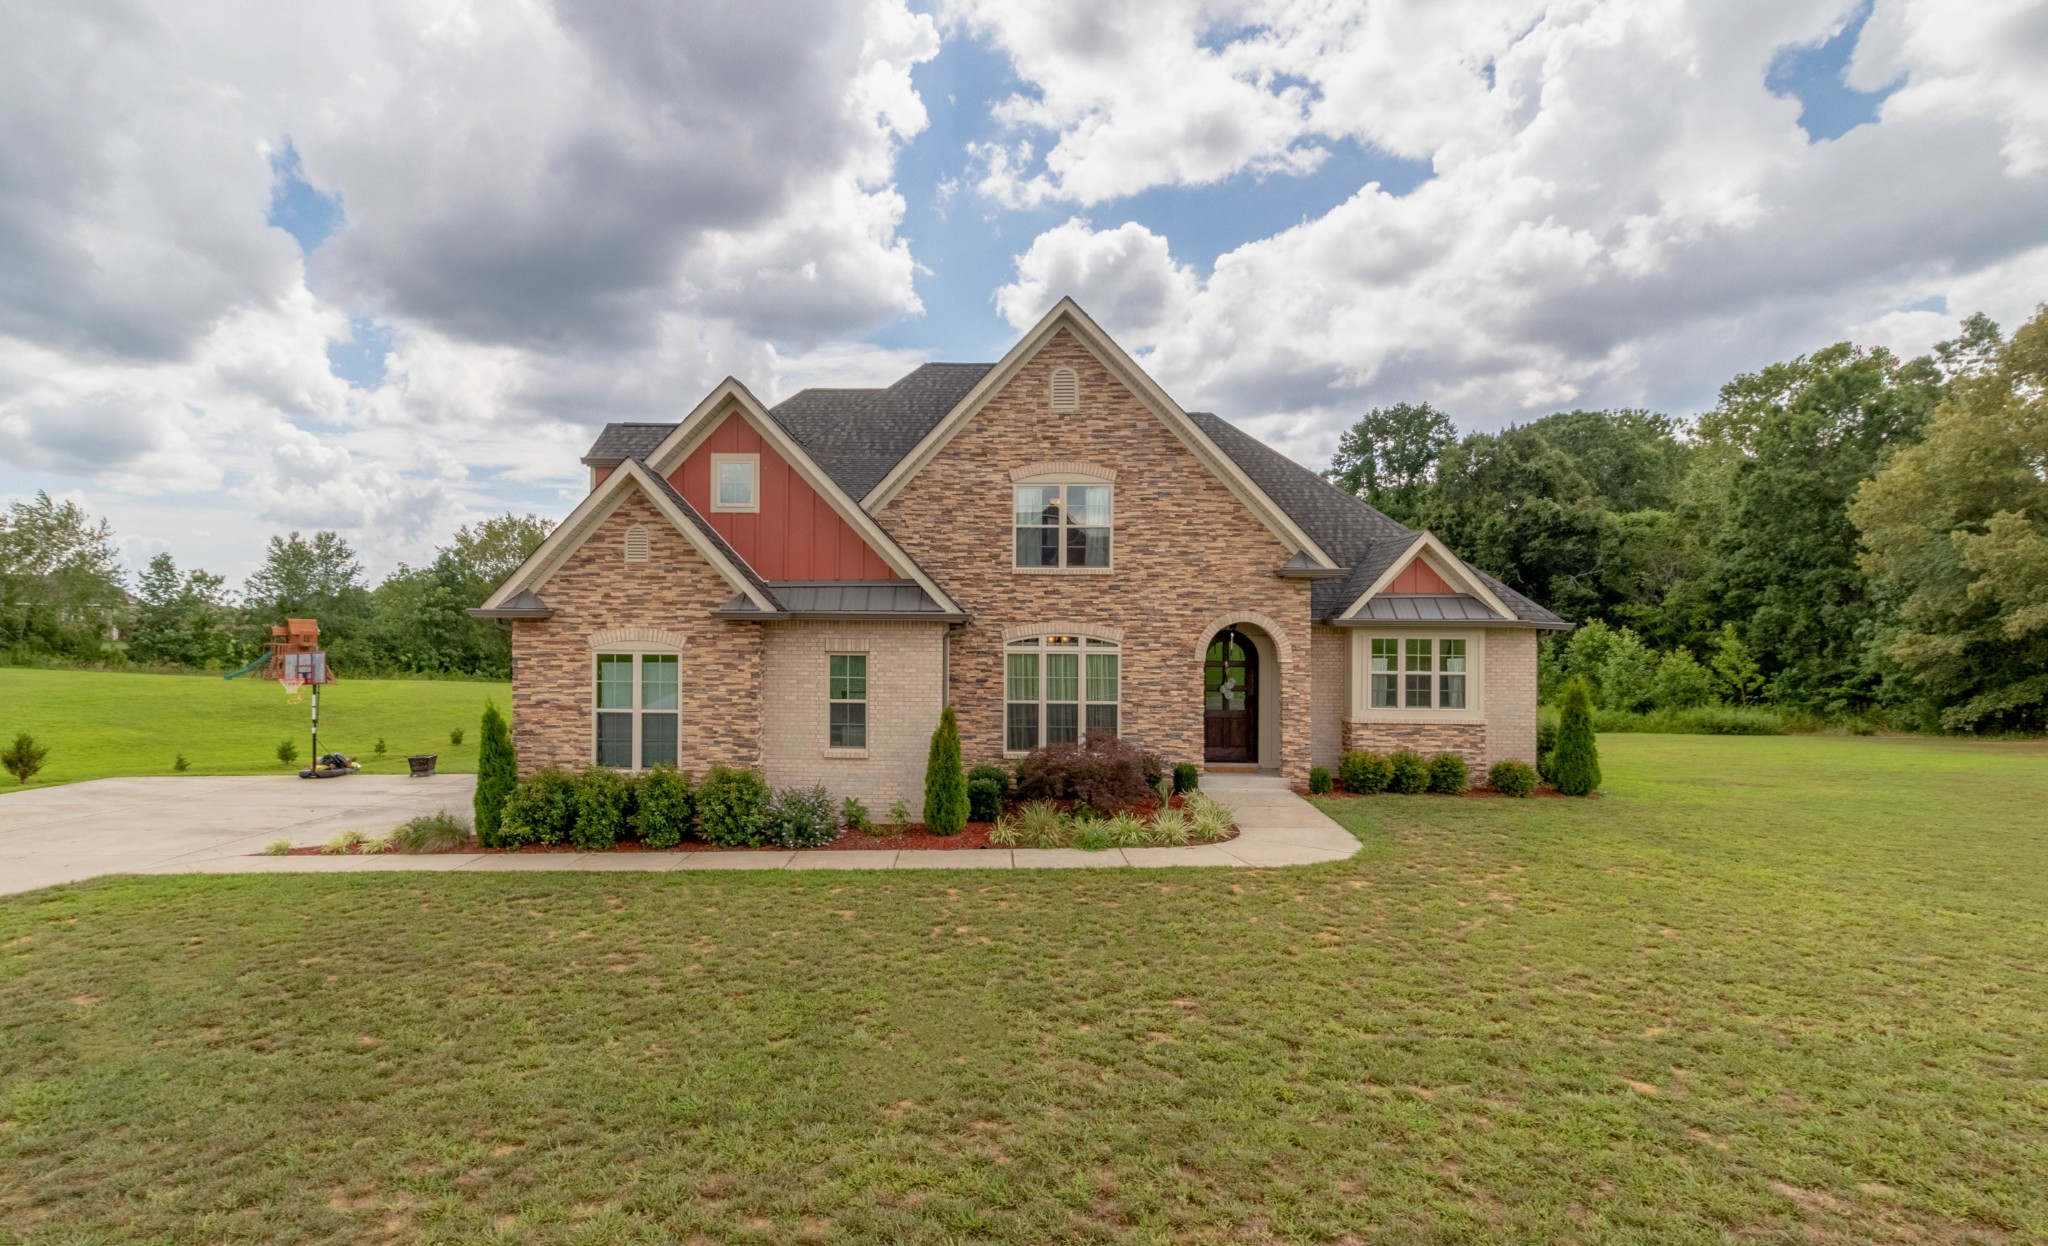 1004 Felts Dr Property Photo - Clarksville, TN real estate listing